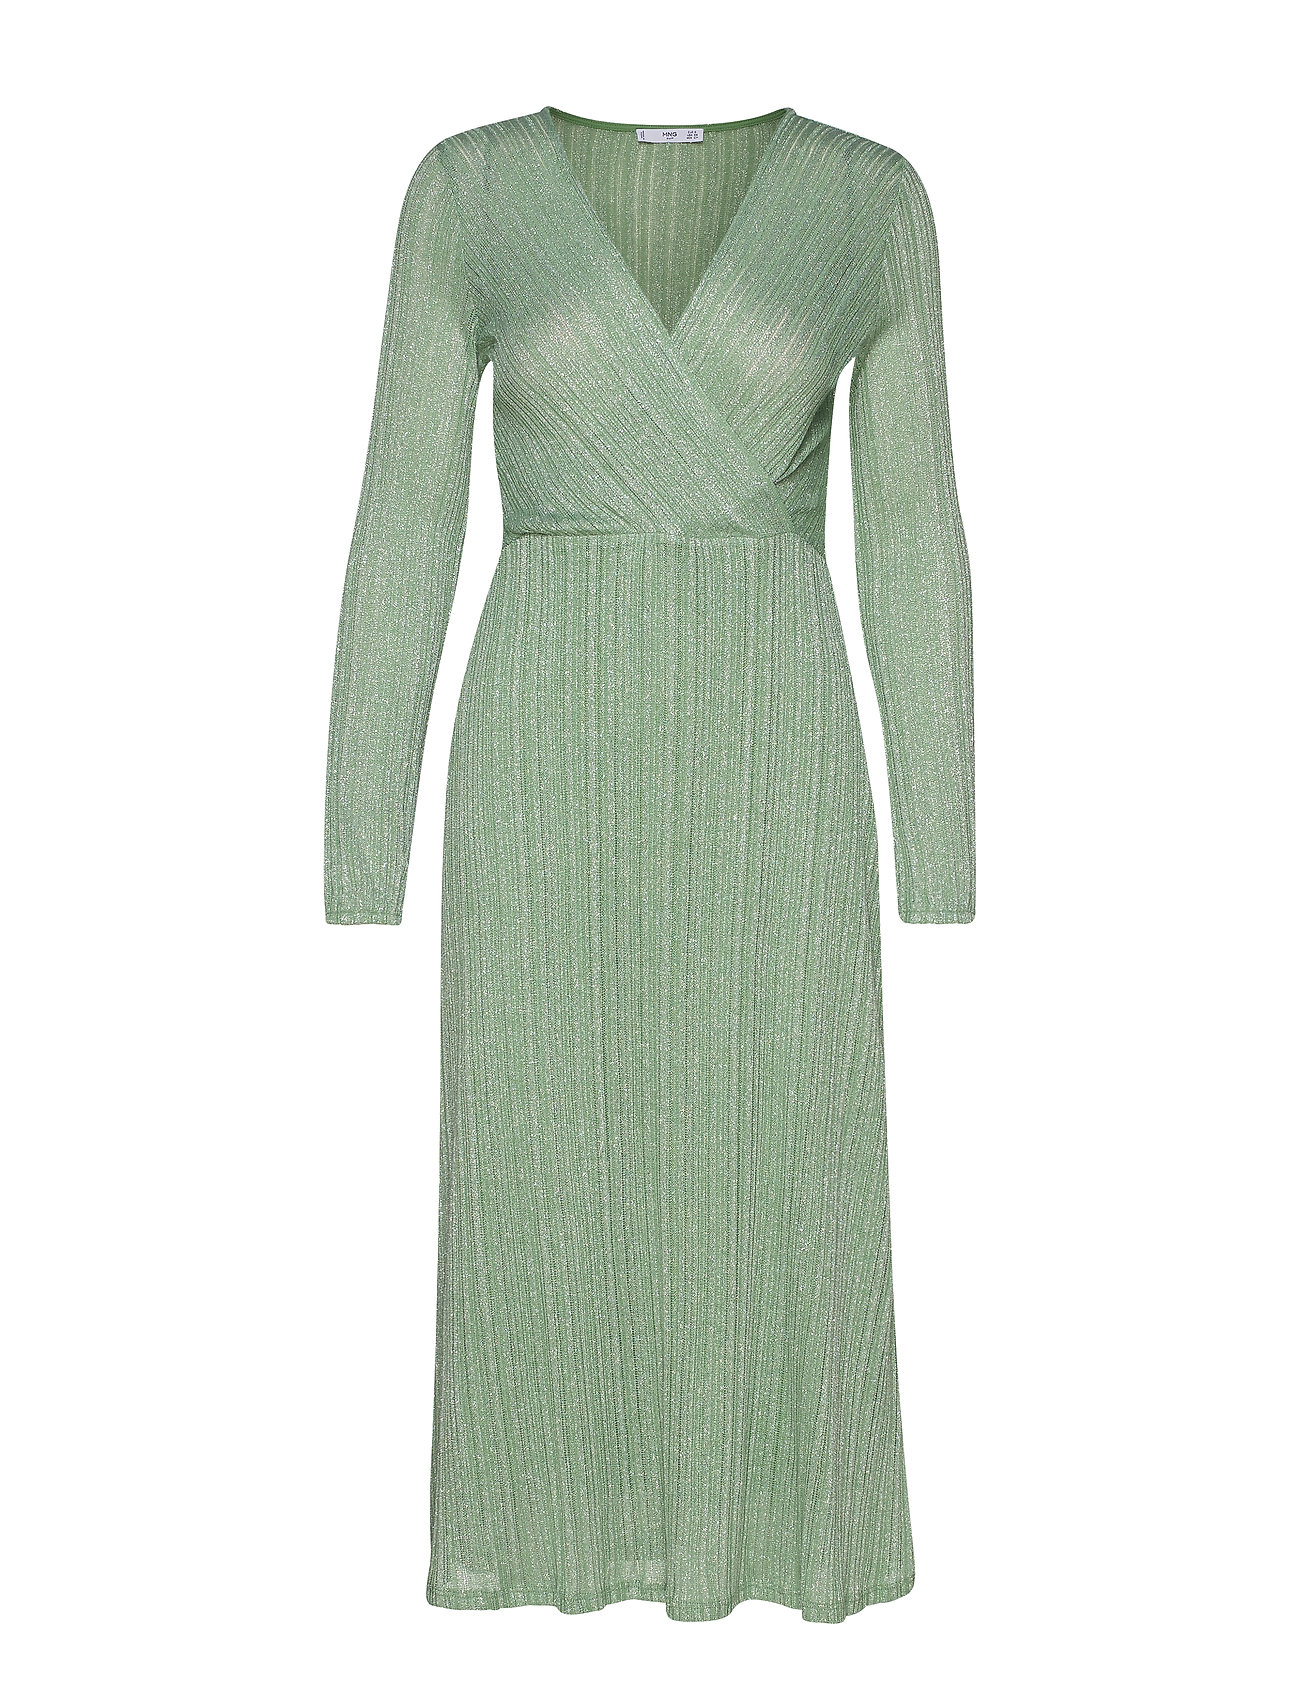 Mango Metallic thread dress - GREEN